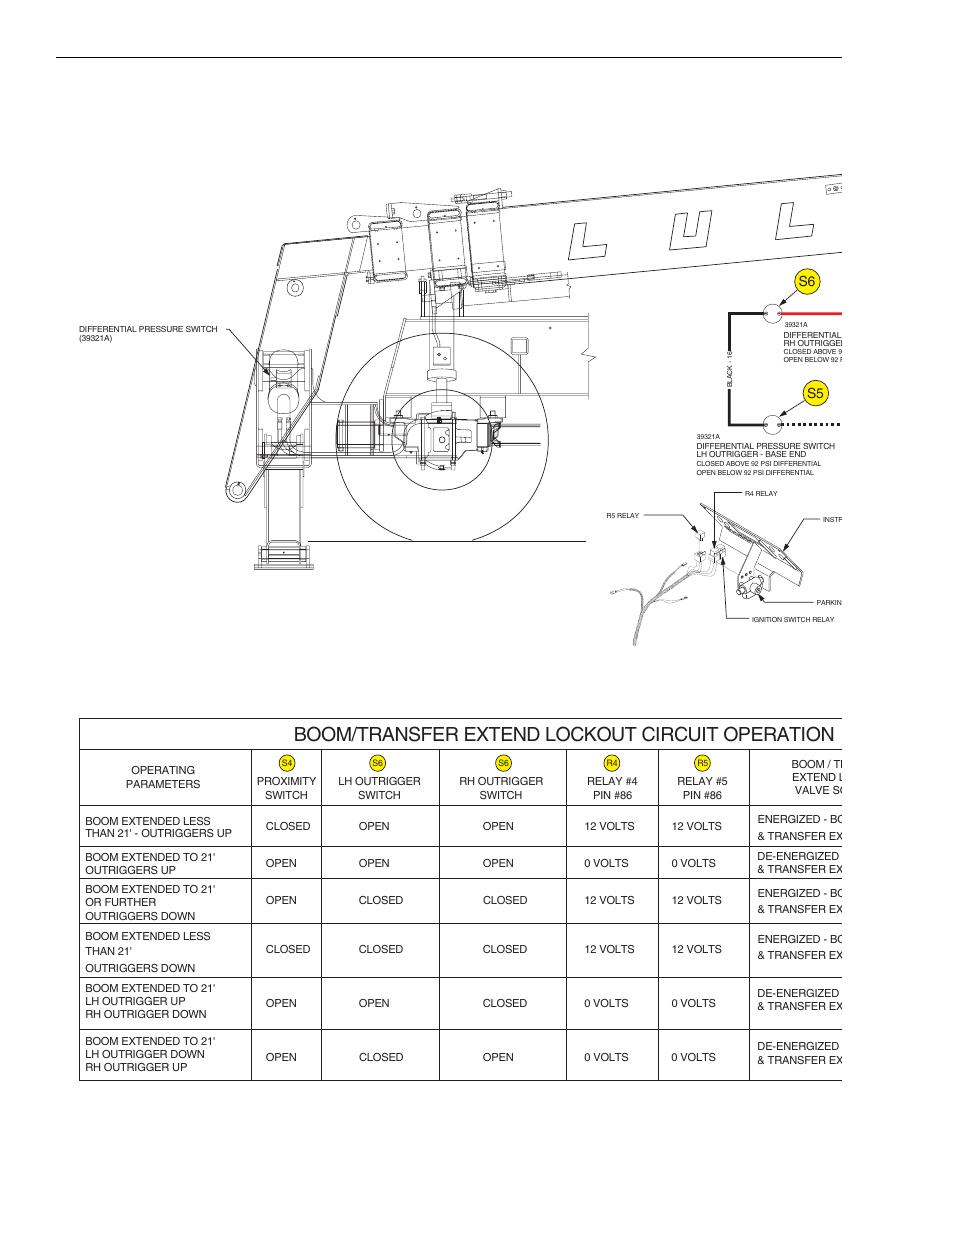 ez boom wiring diagram john deere 210 go j0497 library